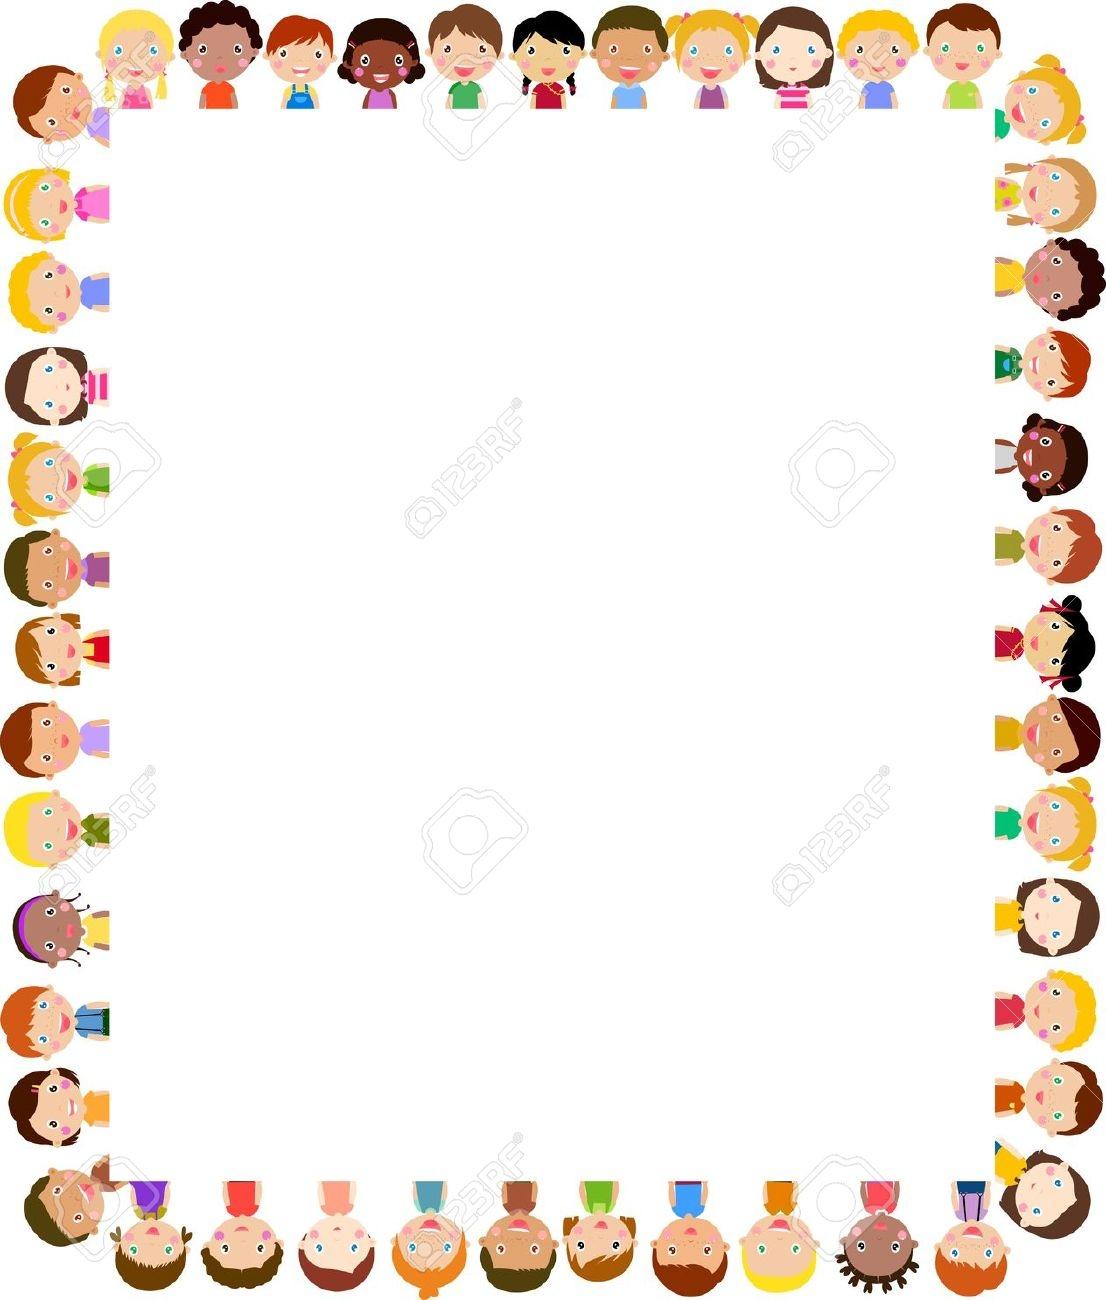 christmas photo frames for kids - Ideal.vistalist.co